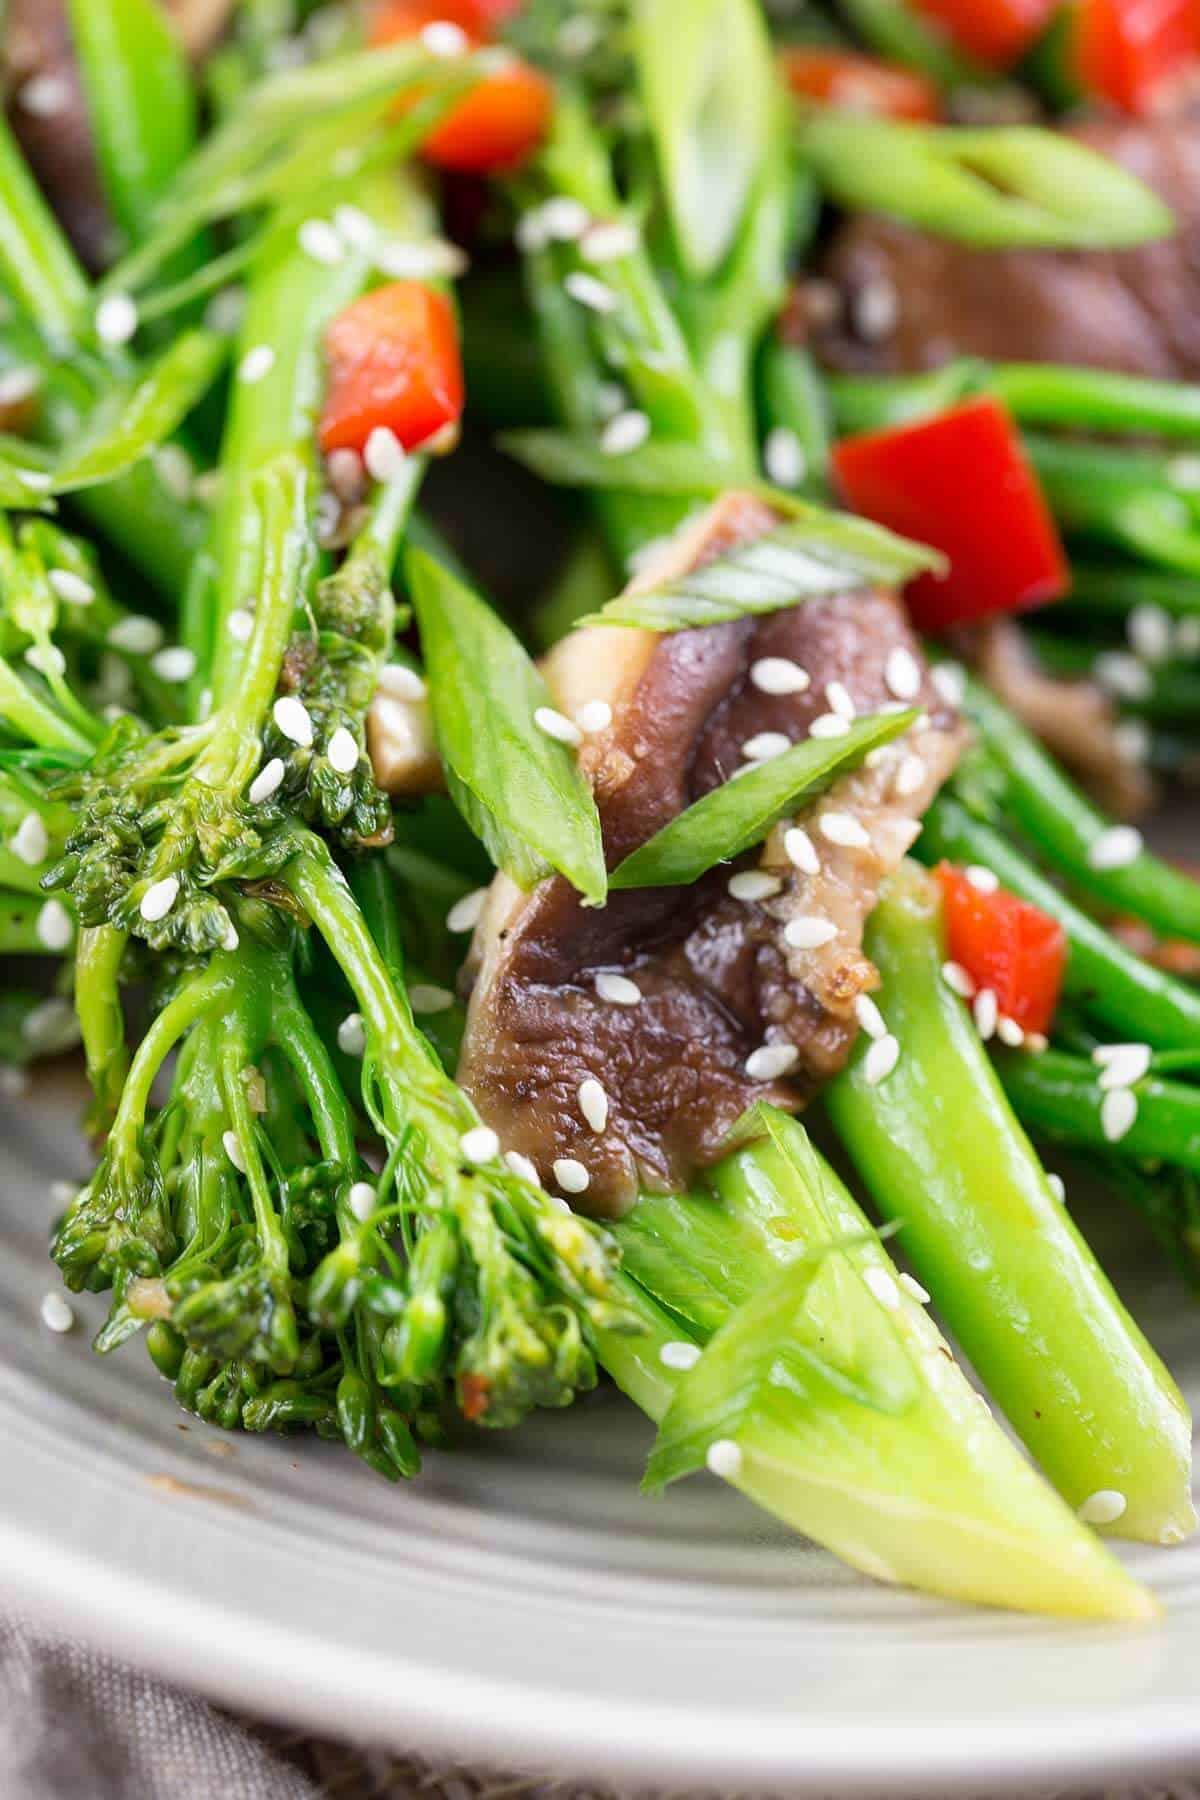 Broccolini and shiitake mushroom stir-fry with sesame seeds | jessicagavin.com #chineserecipes